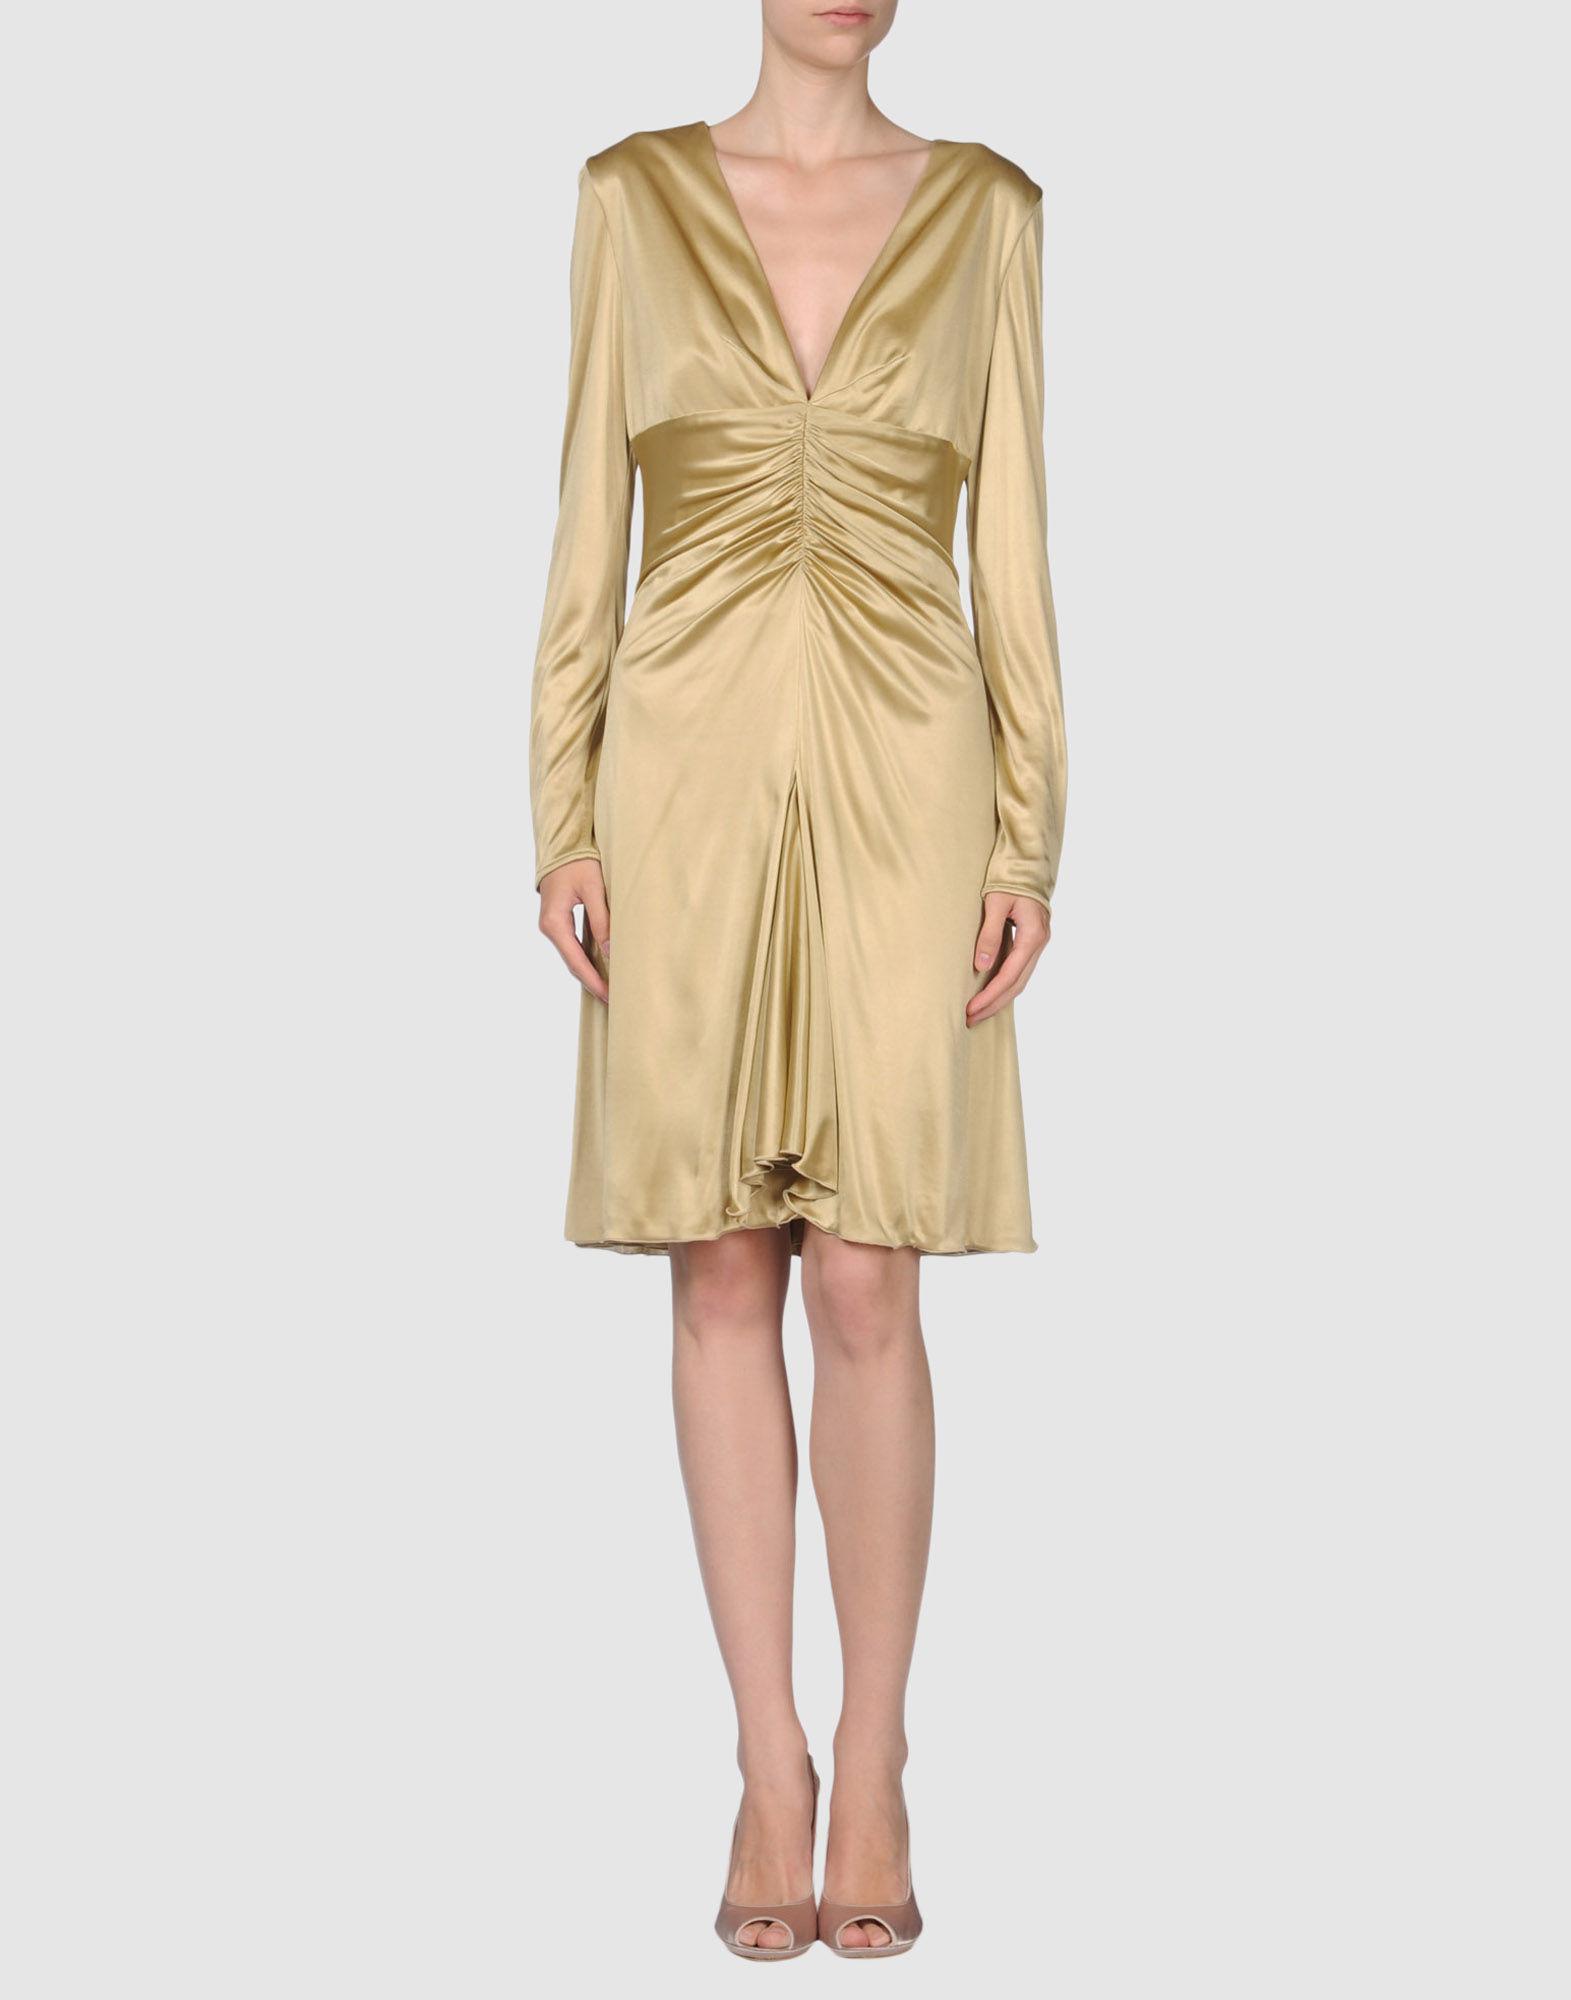 34224931WG 14 f - Evening Φορεματα Versace 2011 2012 Κωδ.02